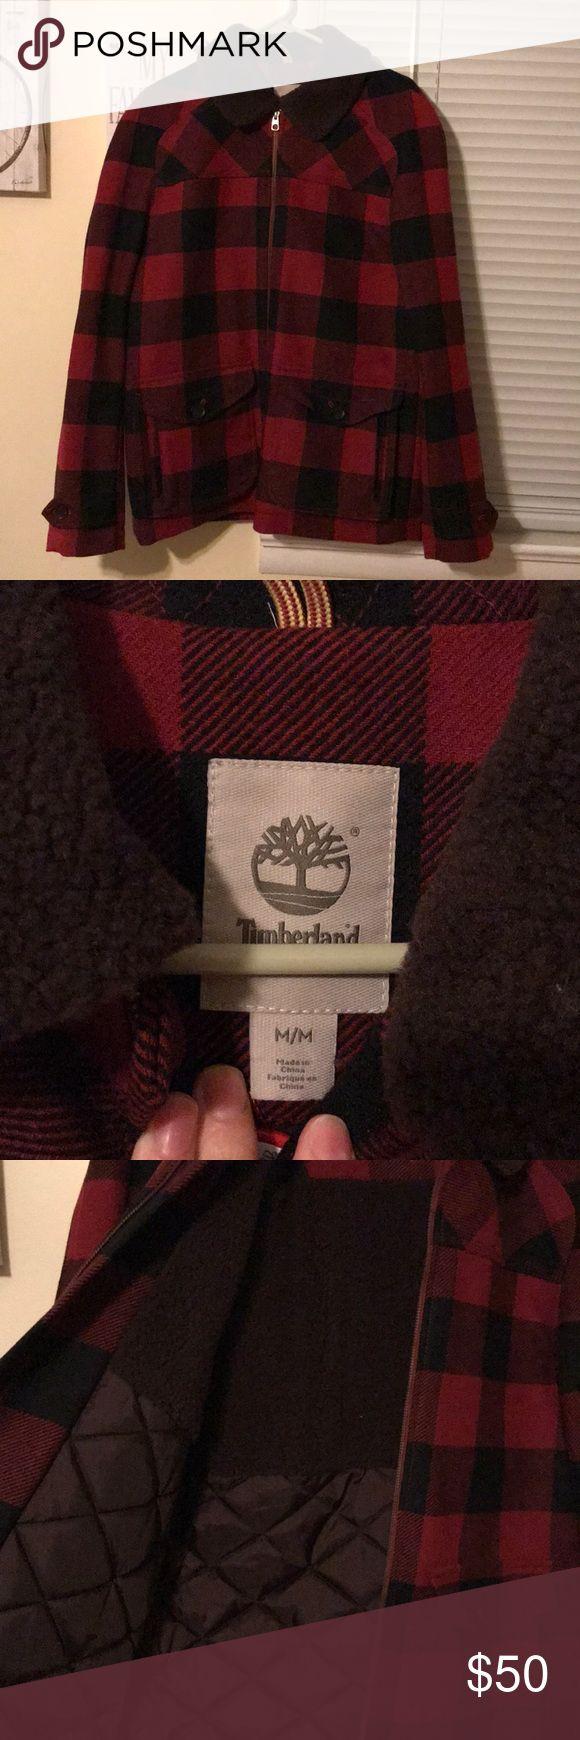 Checkered Men's Timberland Jacket Red and black checkered Timberland Jacket with brown collar. Size medium. NWOT Timberland Jackets & Coats